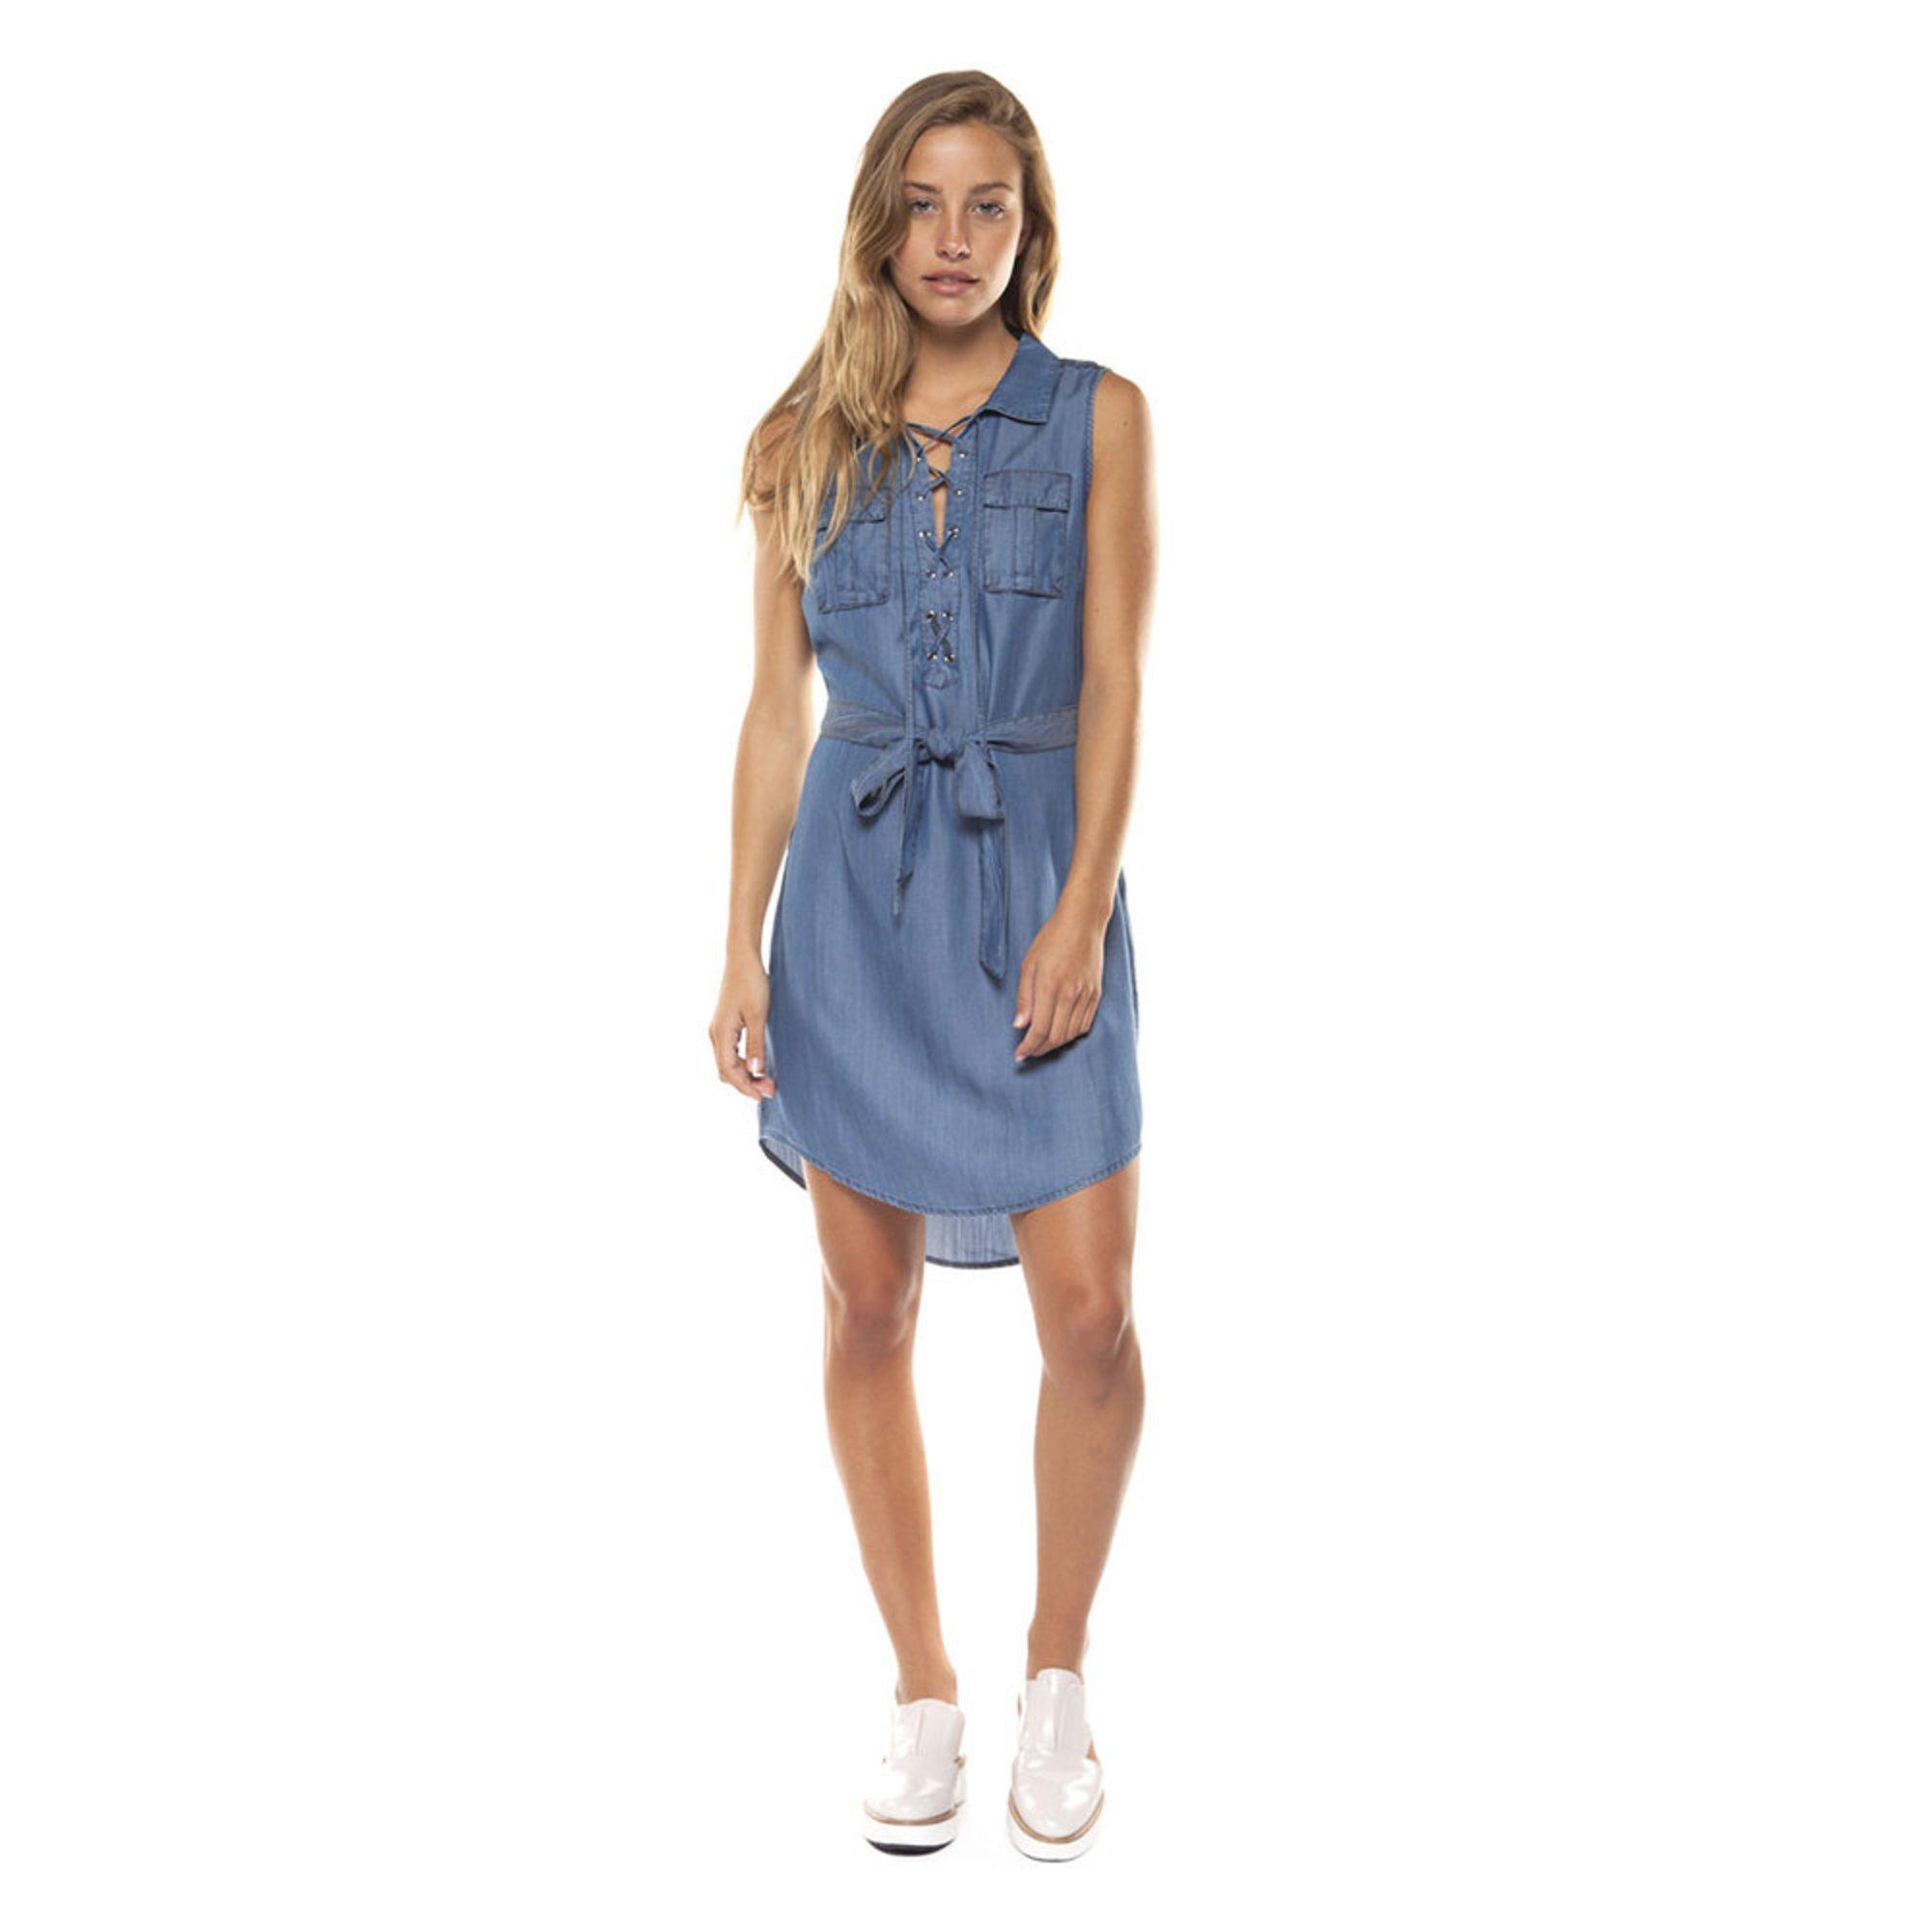 ab951e828b2 Denim Cool Dresses - Gomes Weine AG